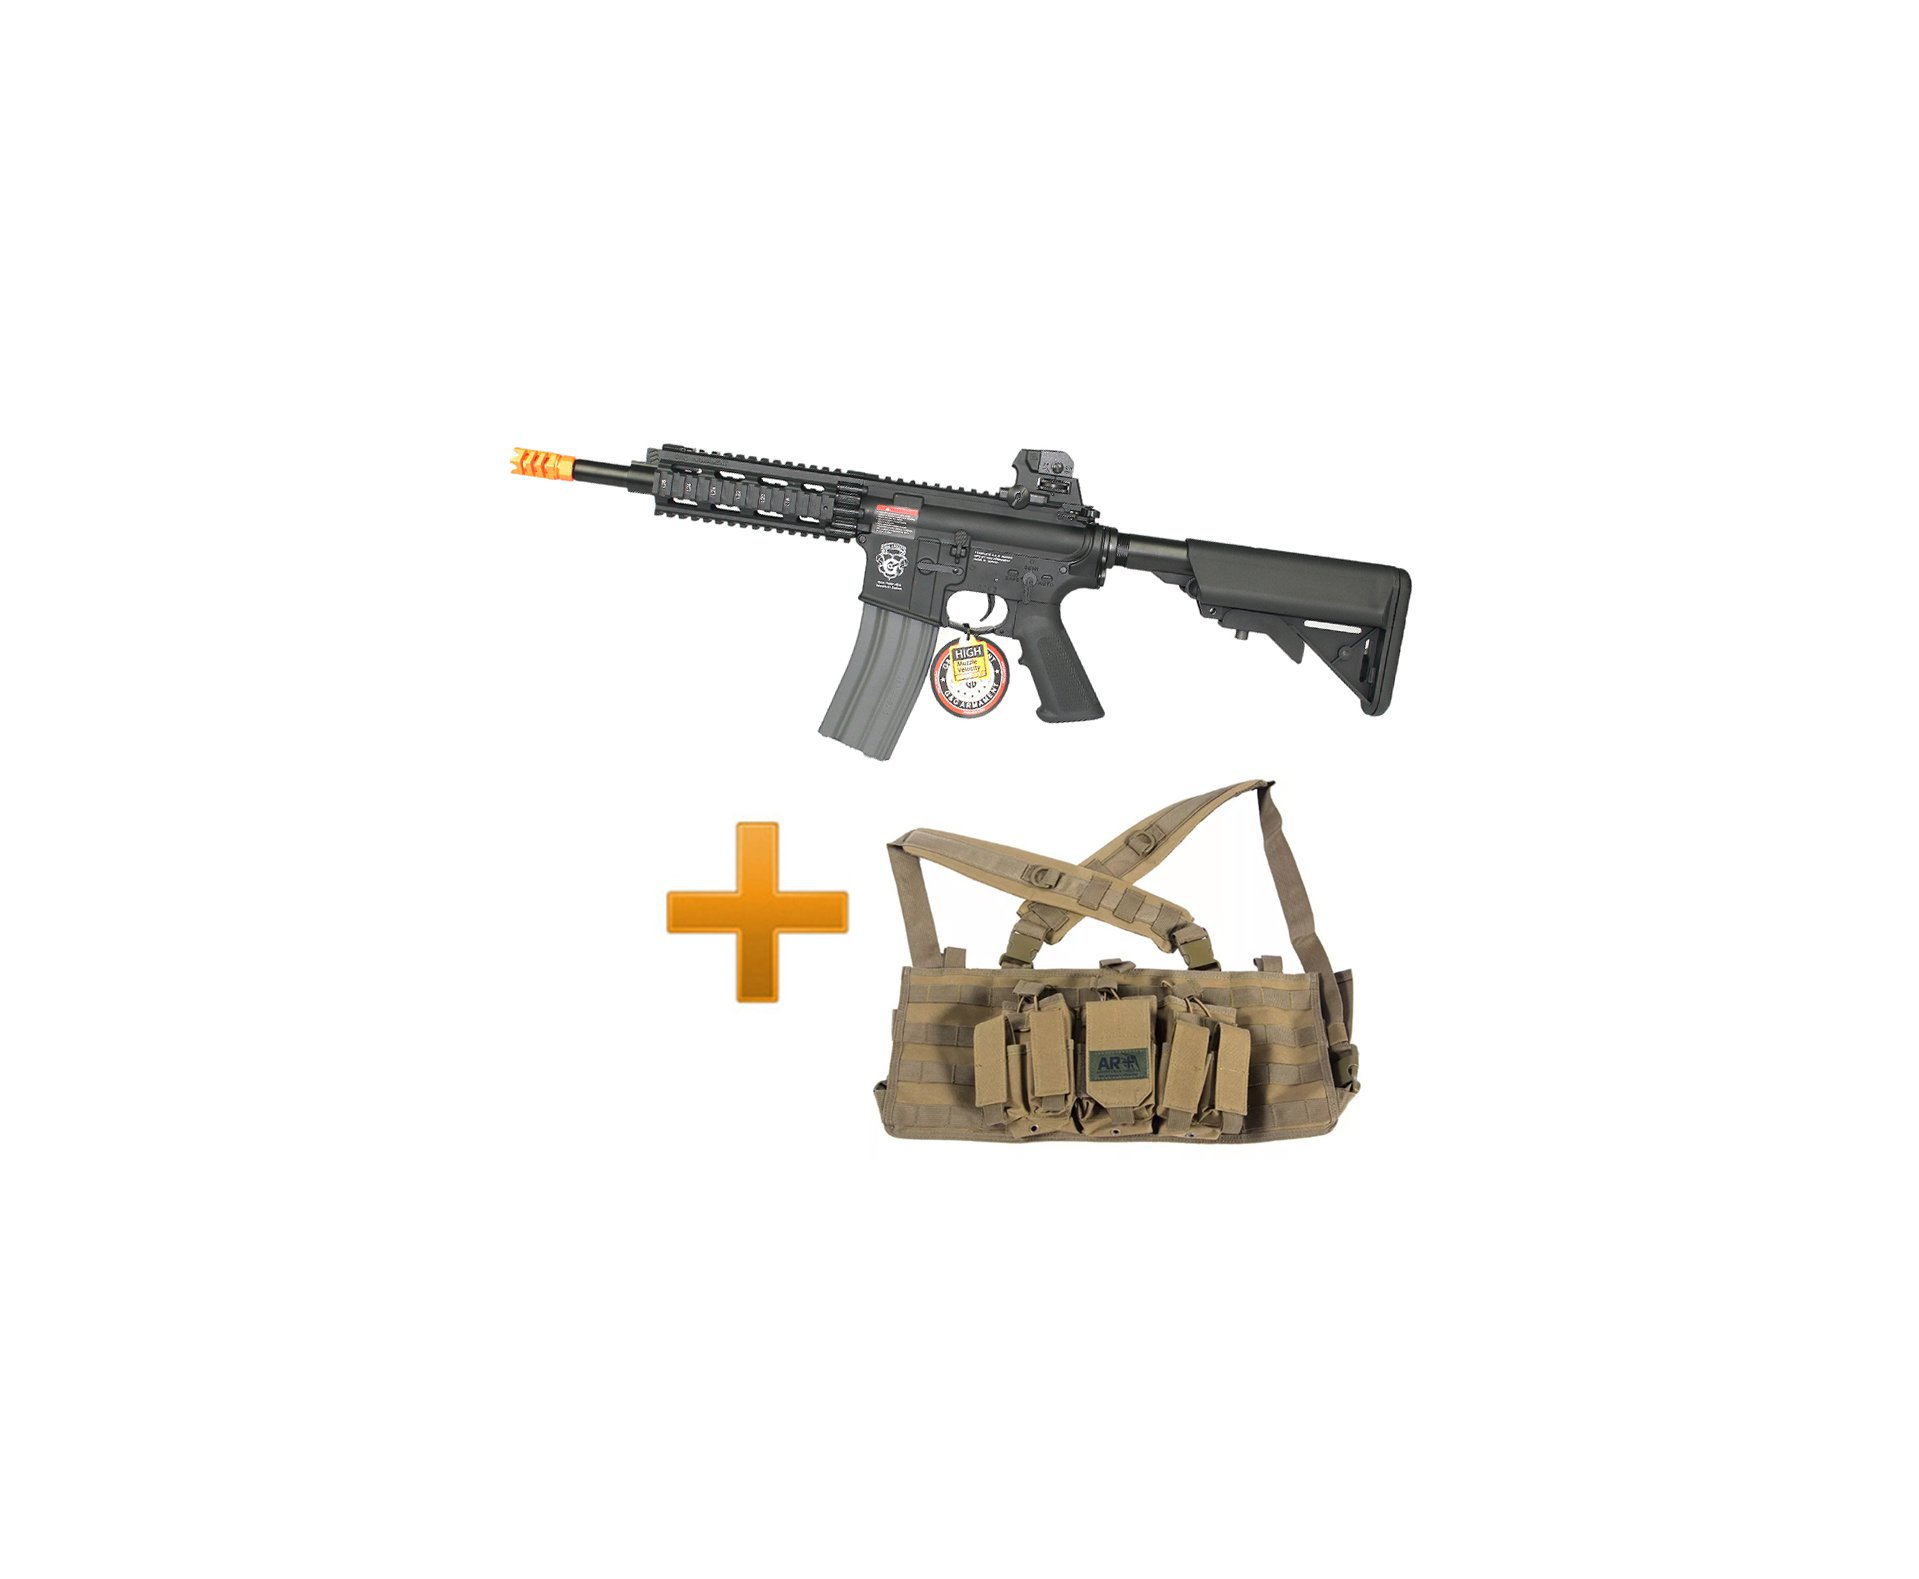 Rifle De Airsoft Gr16 Cqw Rush Blowback G&g + Colete Chest Tan Rack